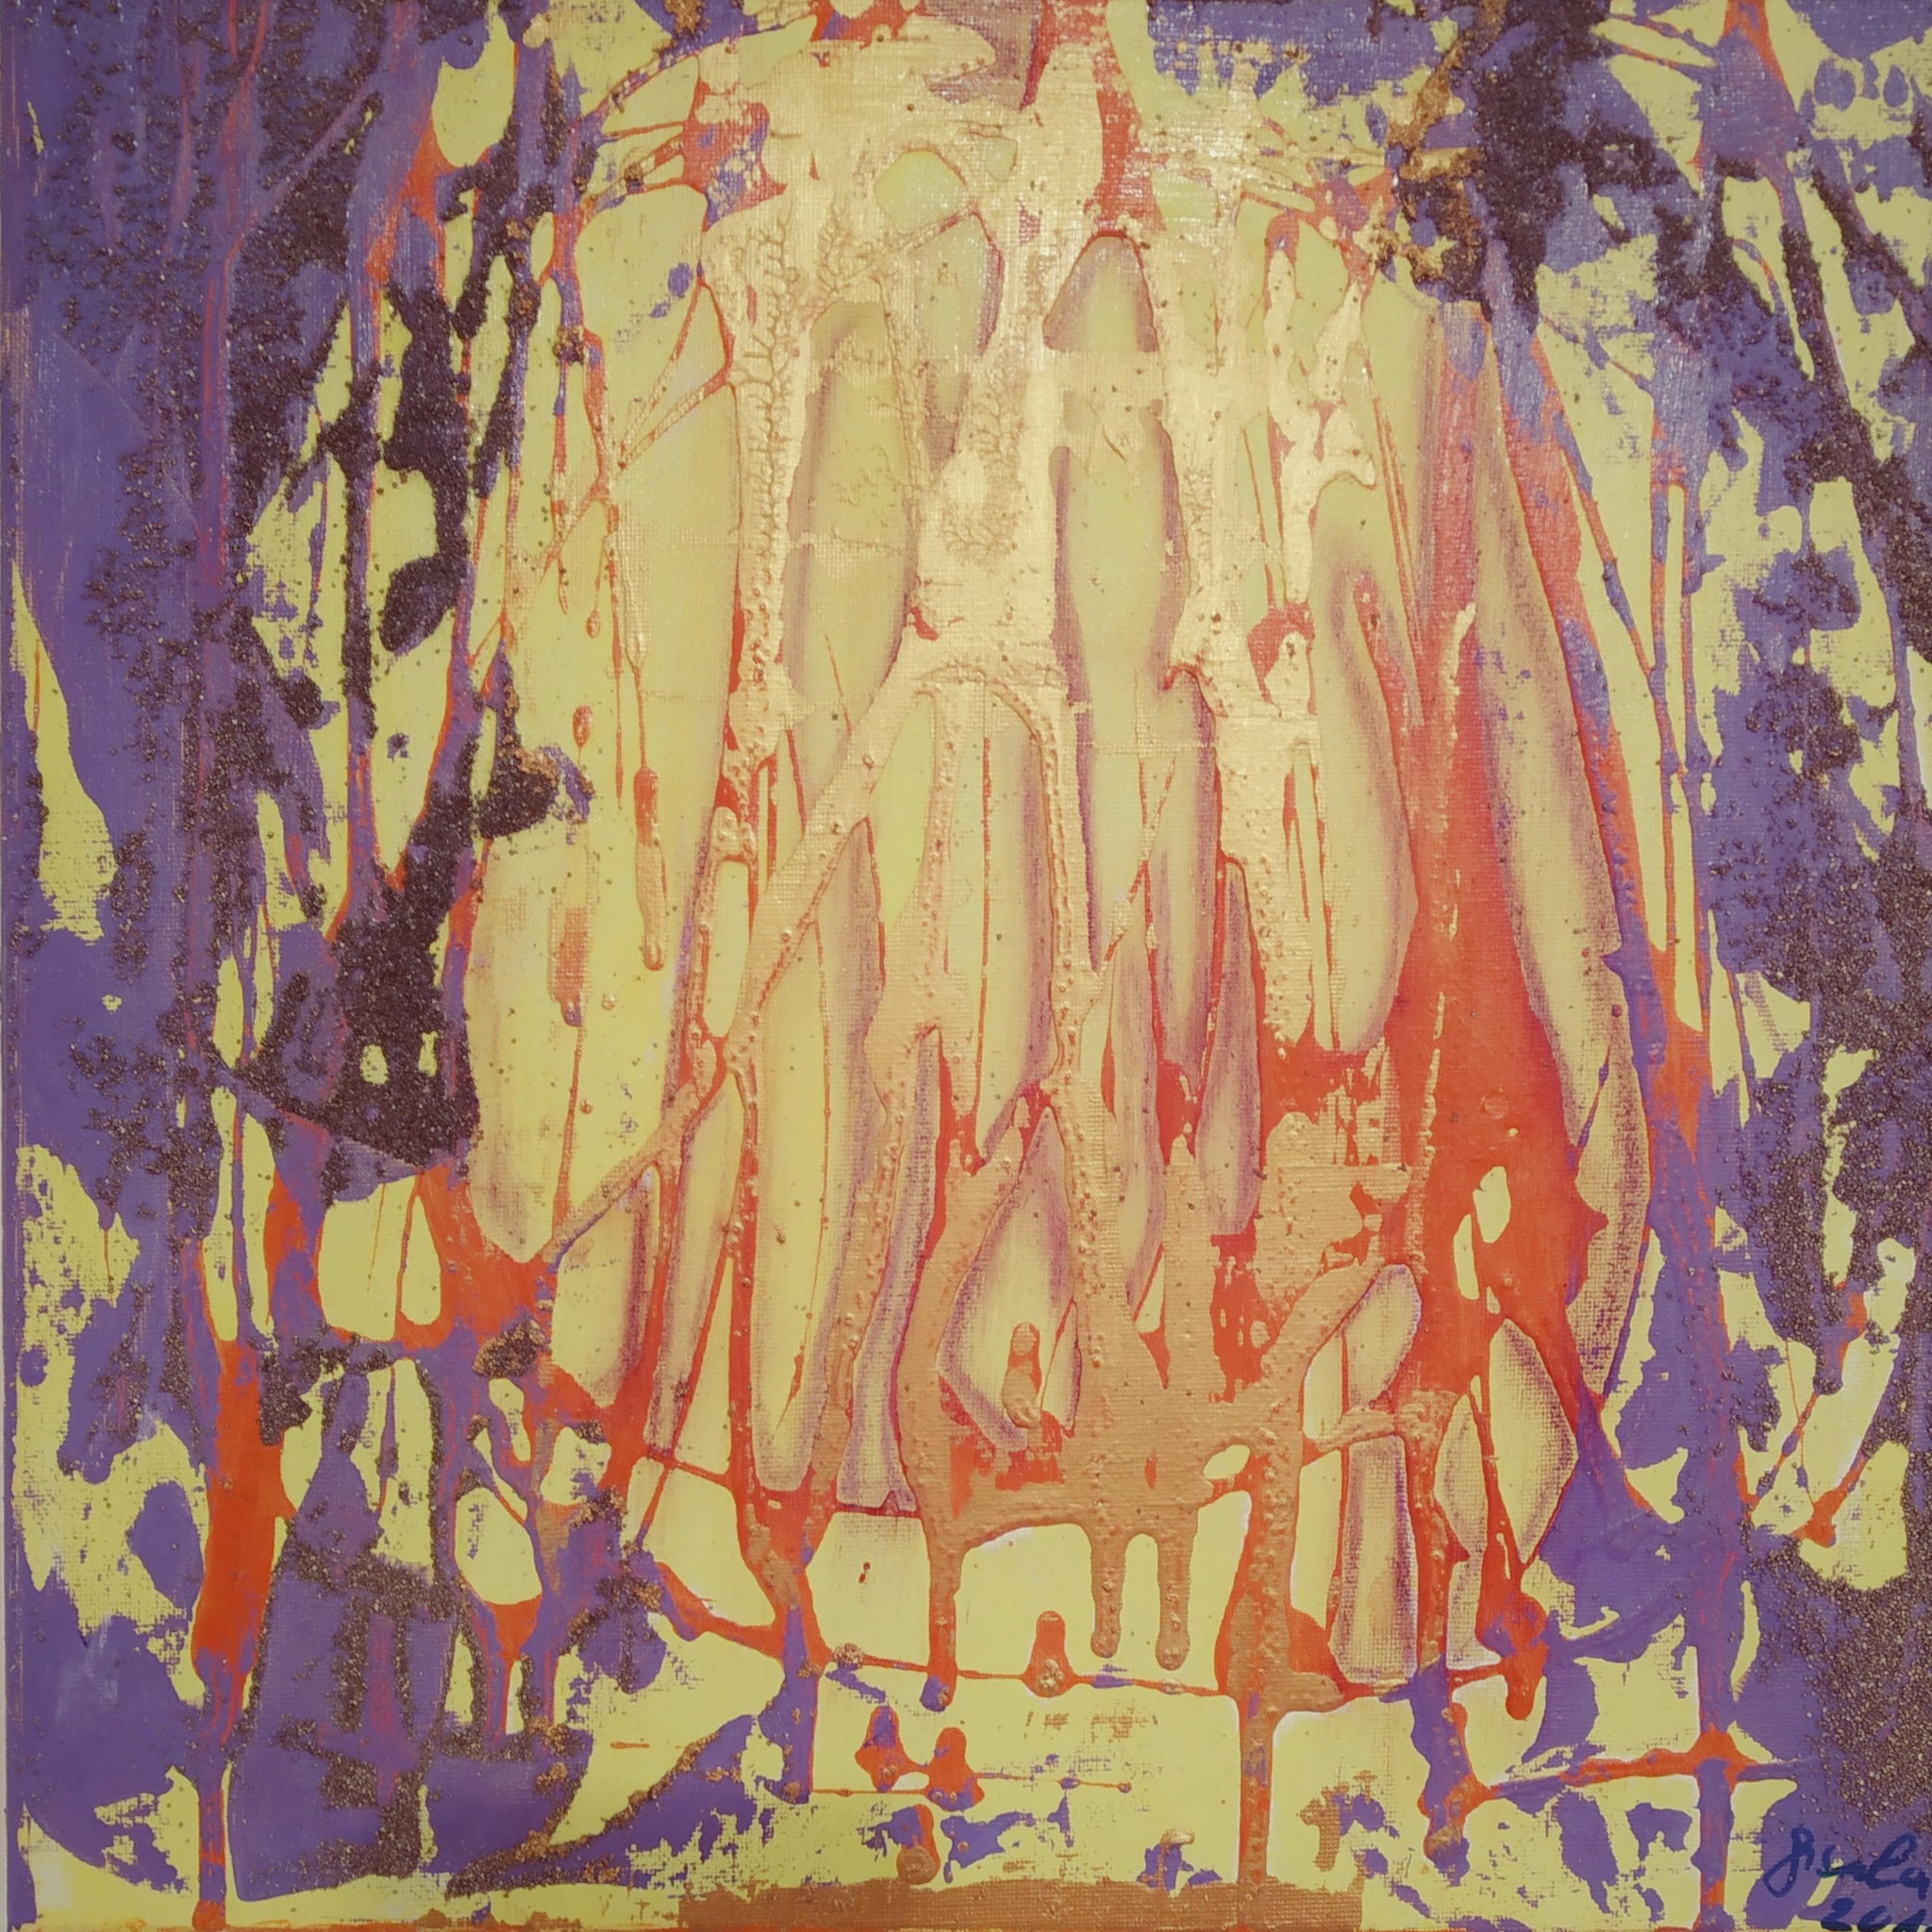 8. Transformation, Acryl auf Leinwand, Grösse 40 x 40 cm